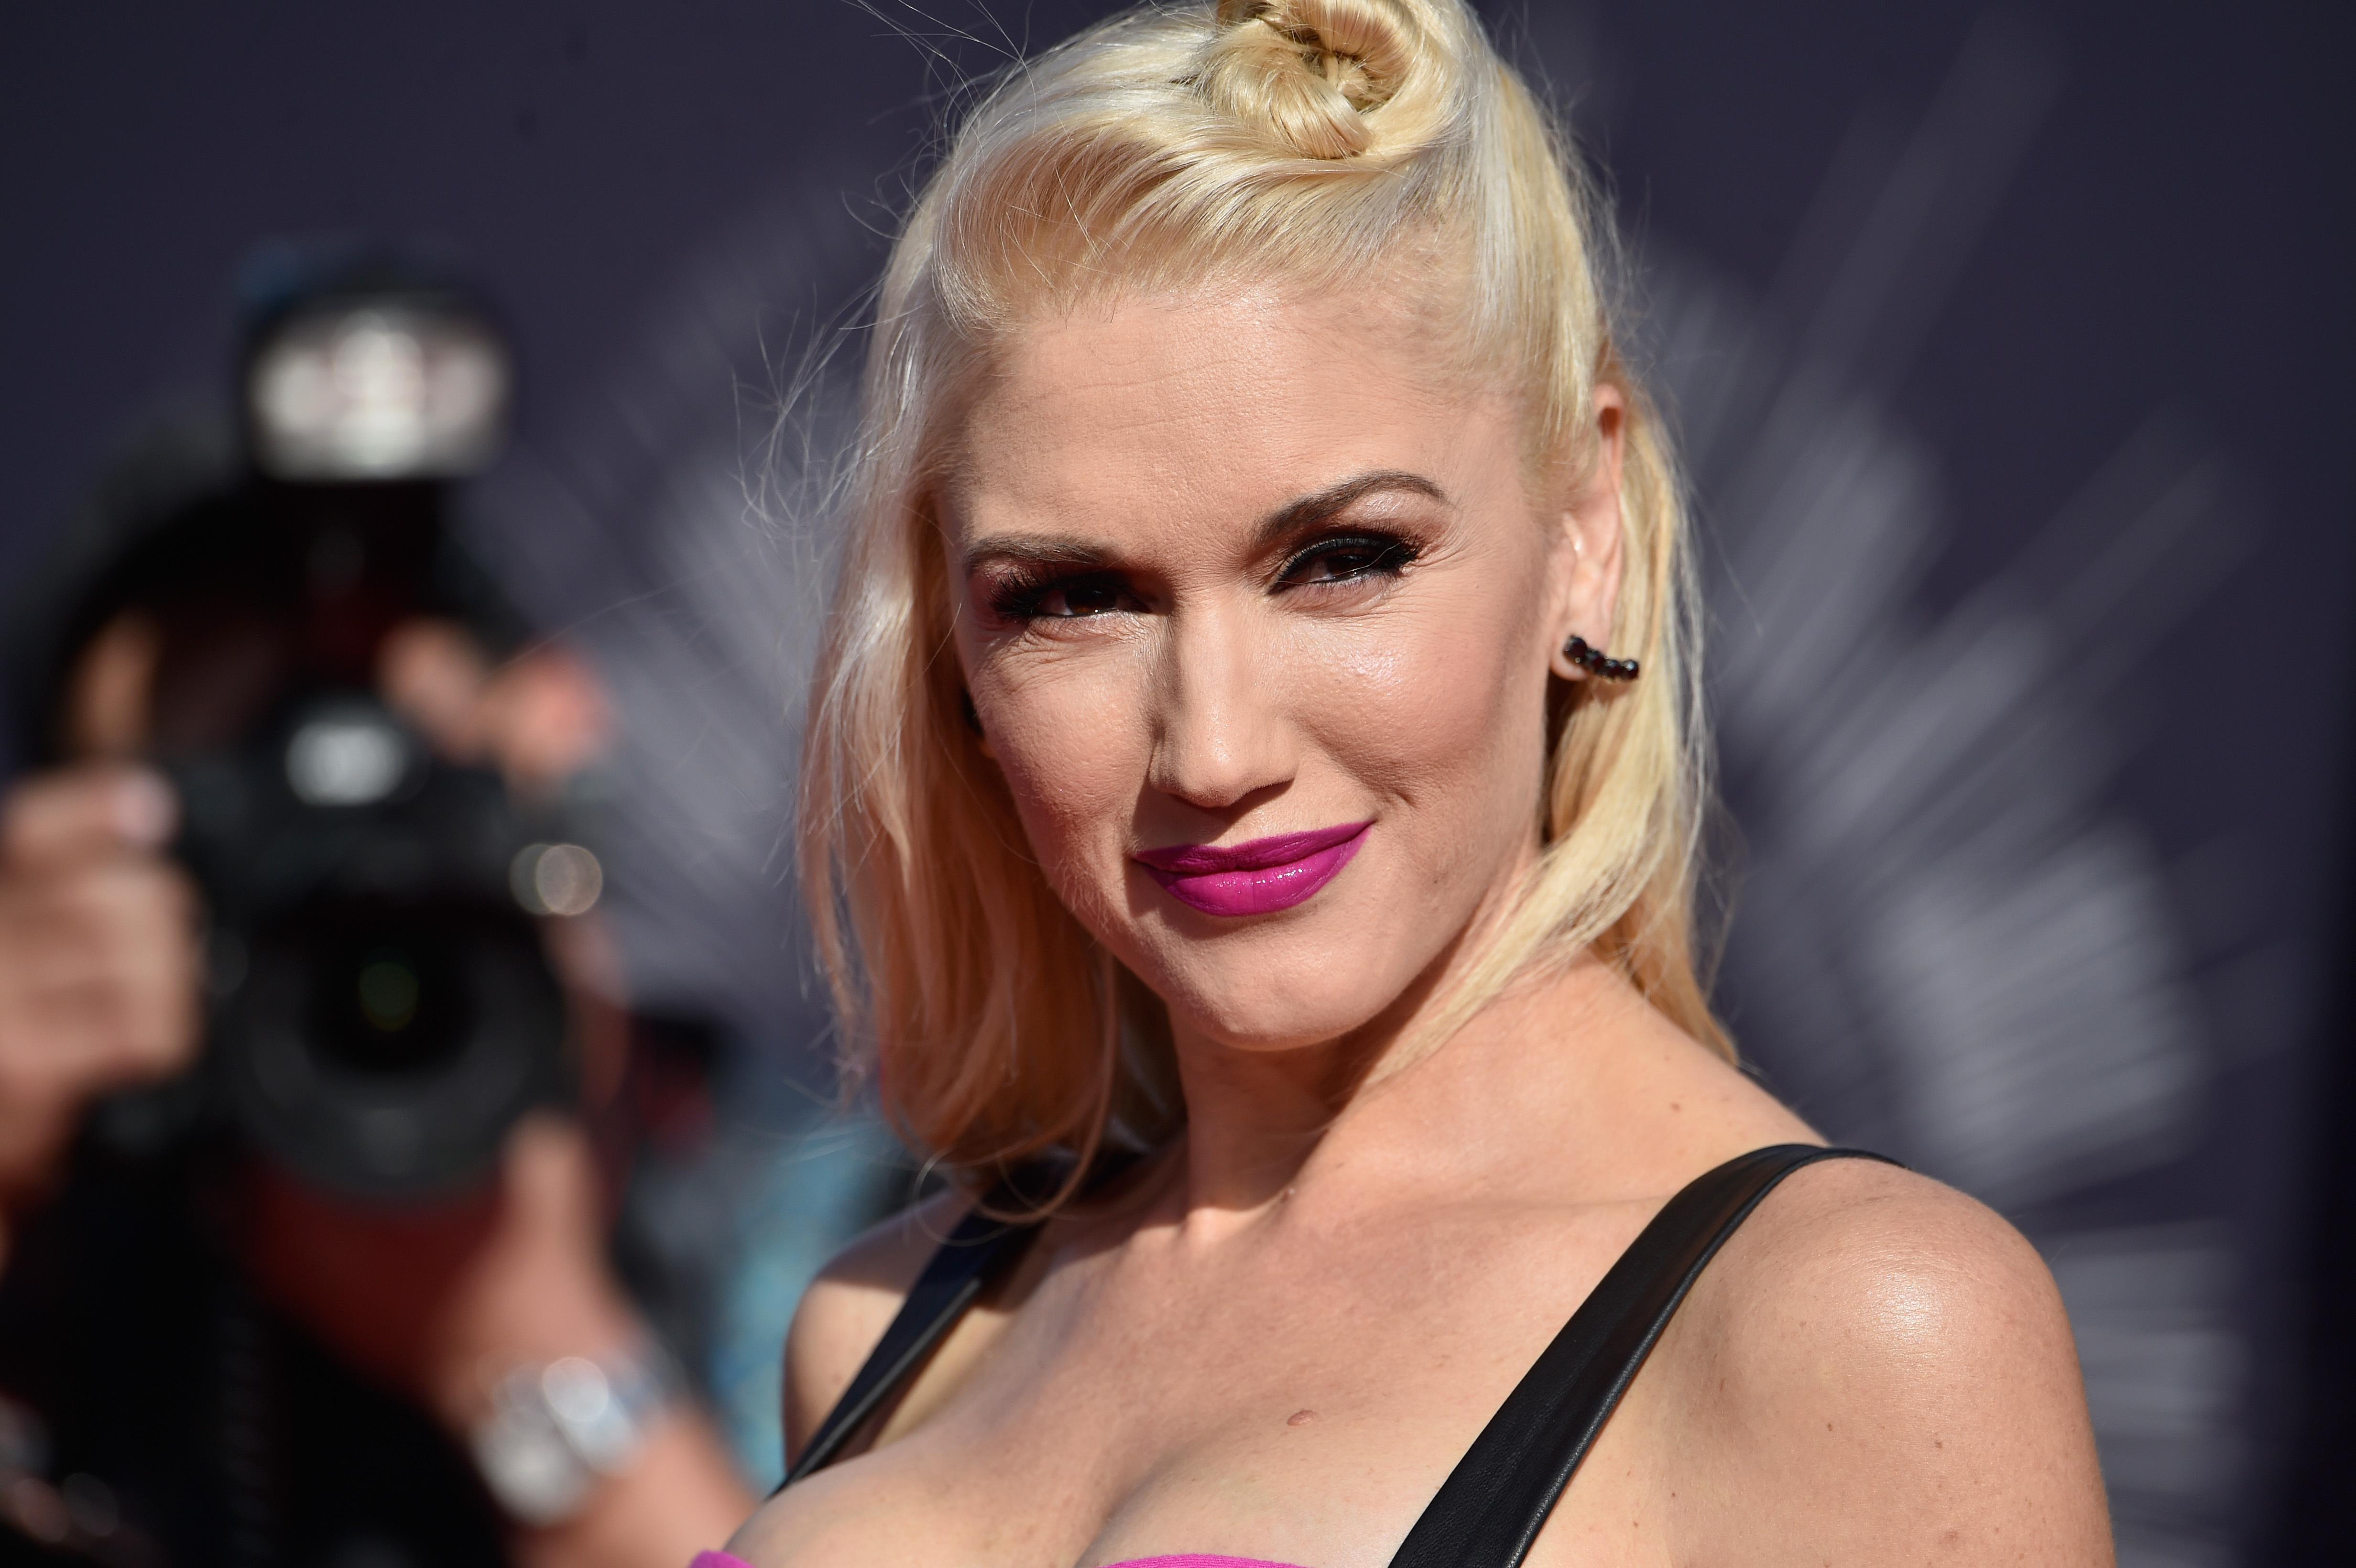 Gwen Stefani Hd Background